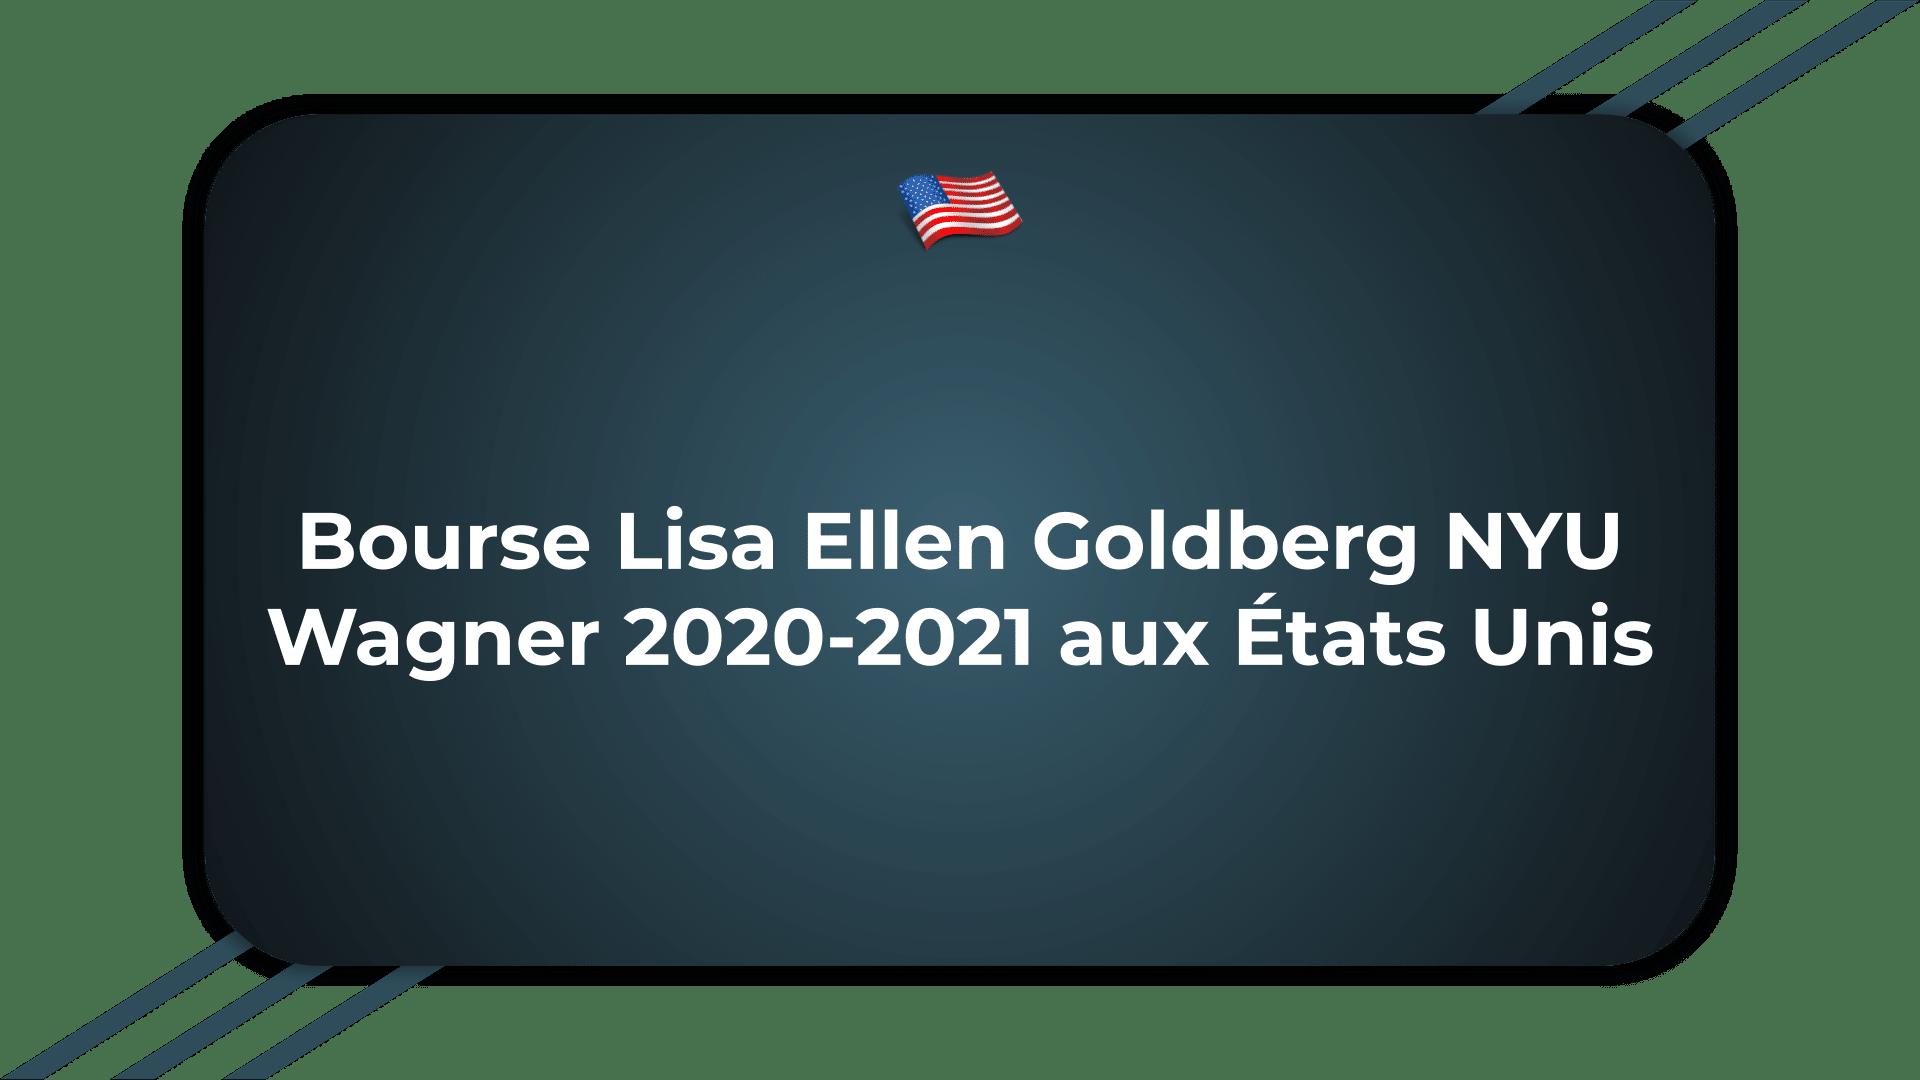 Bourse Lisa Ellen Goldberg NYU Wagner